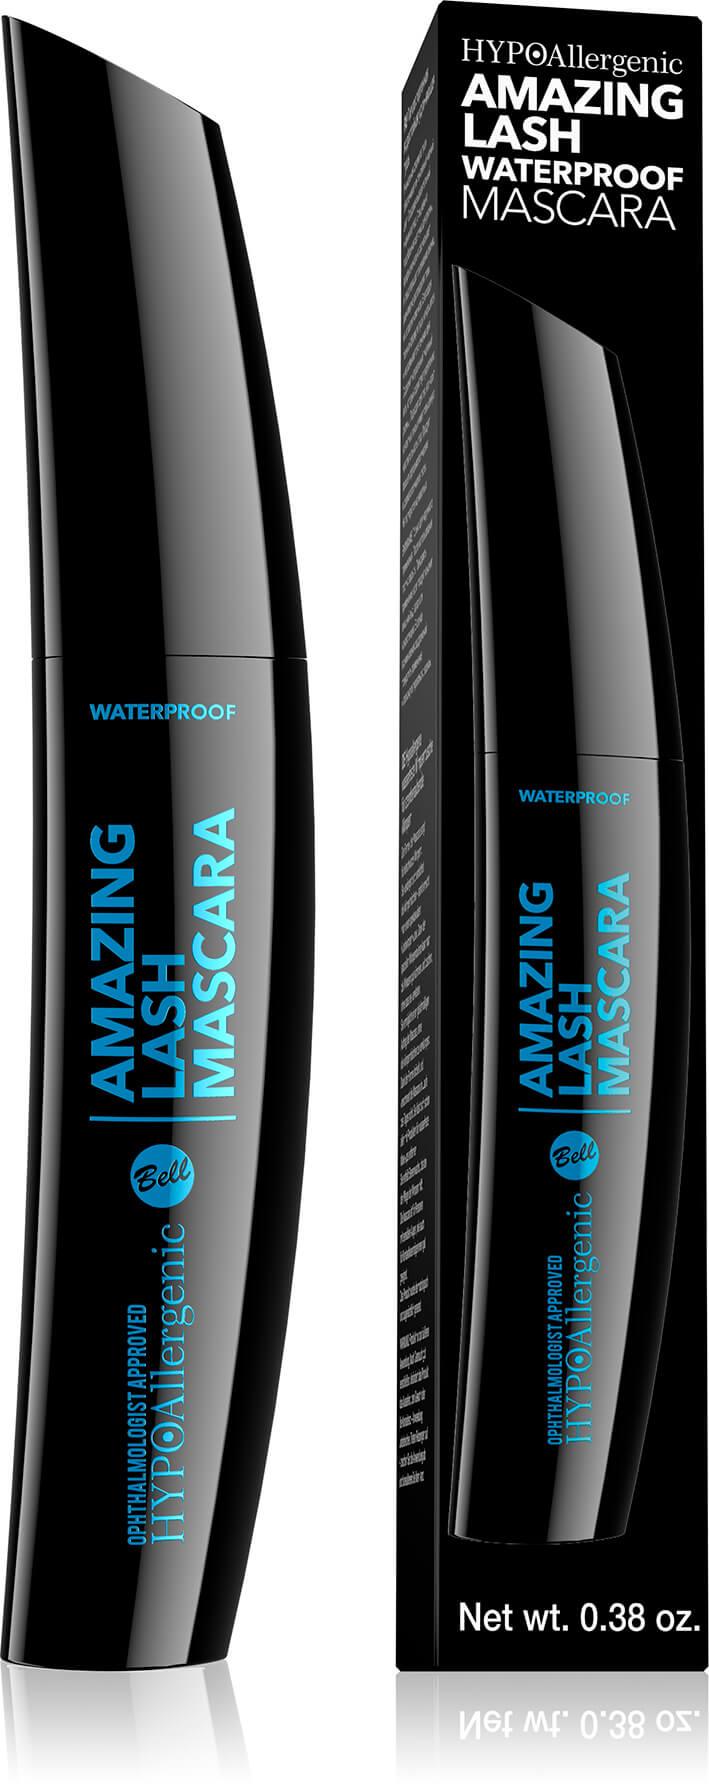 HYPOAllergenic Amazing Lash Waterproof Mascara